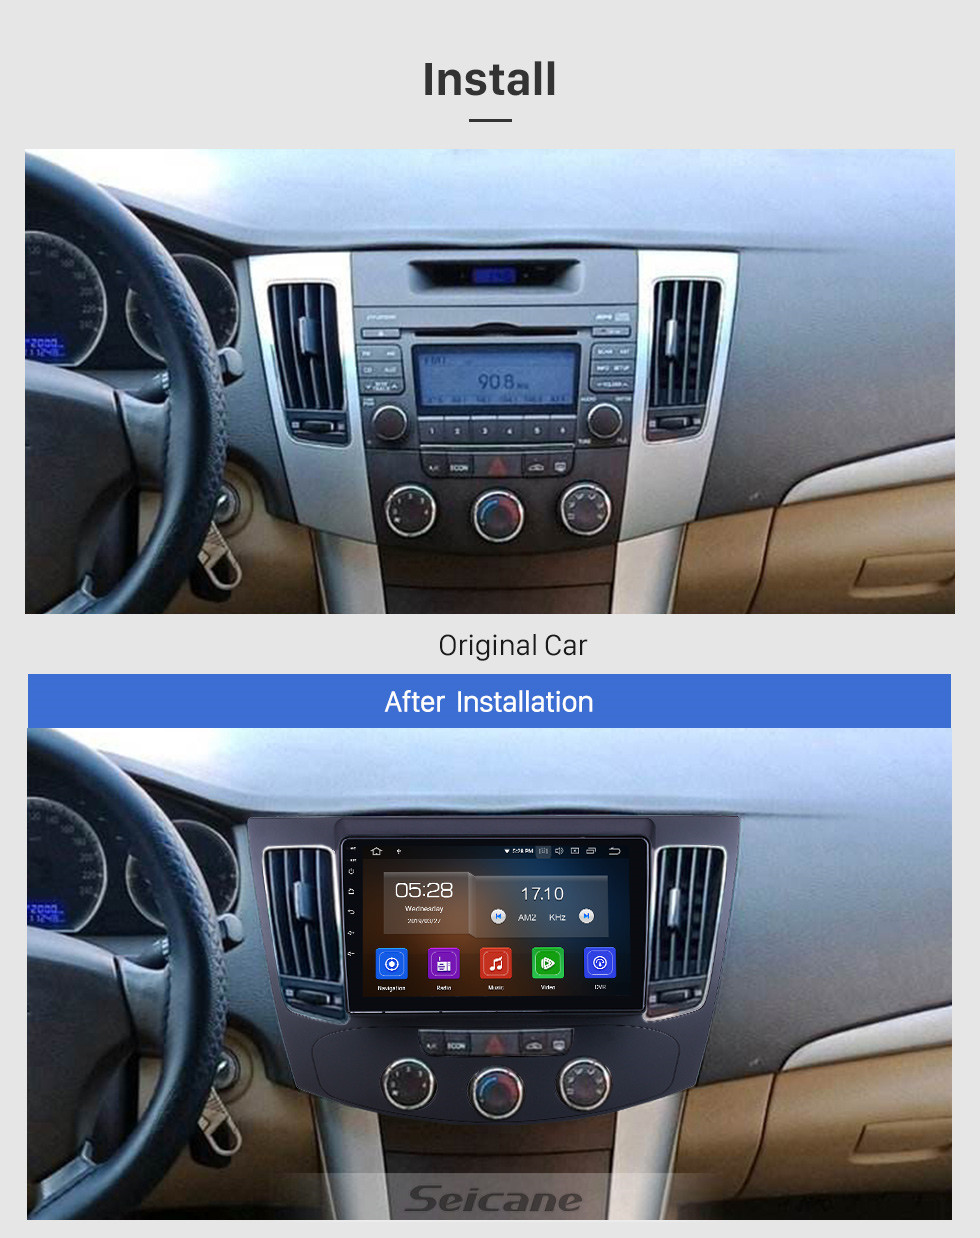 Seicane OEM 9 inch Android 10.0 for 2009 Hyundai Sonata Manual A/C Radio Bluetooth HD Touchscreen GPS Navigation System Carplay support DVR